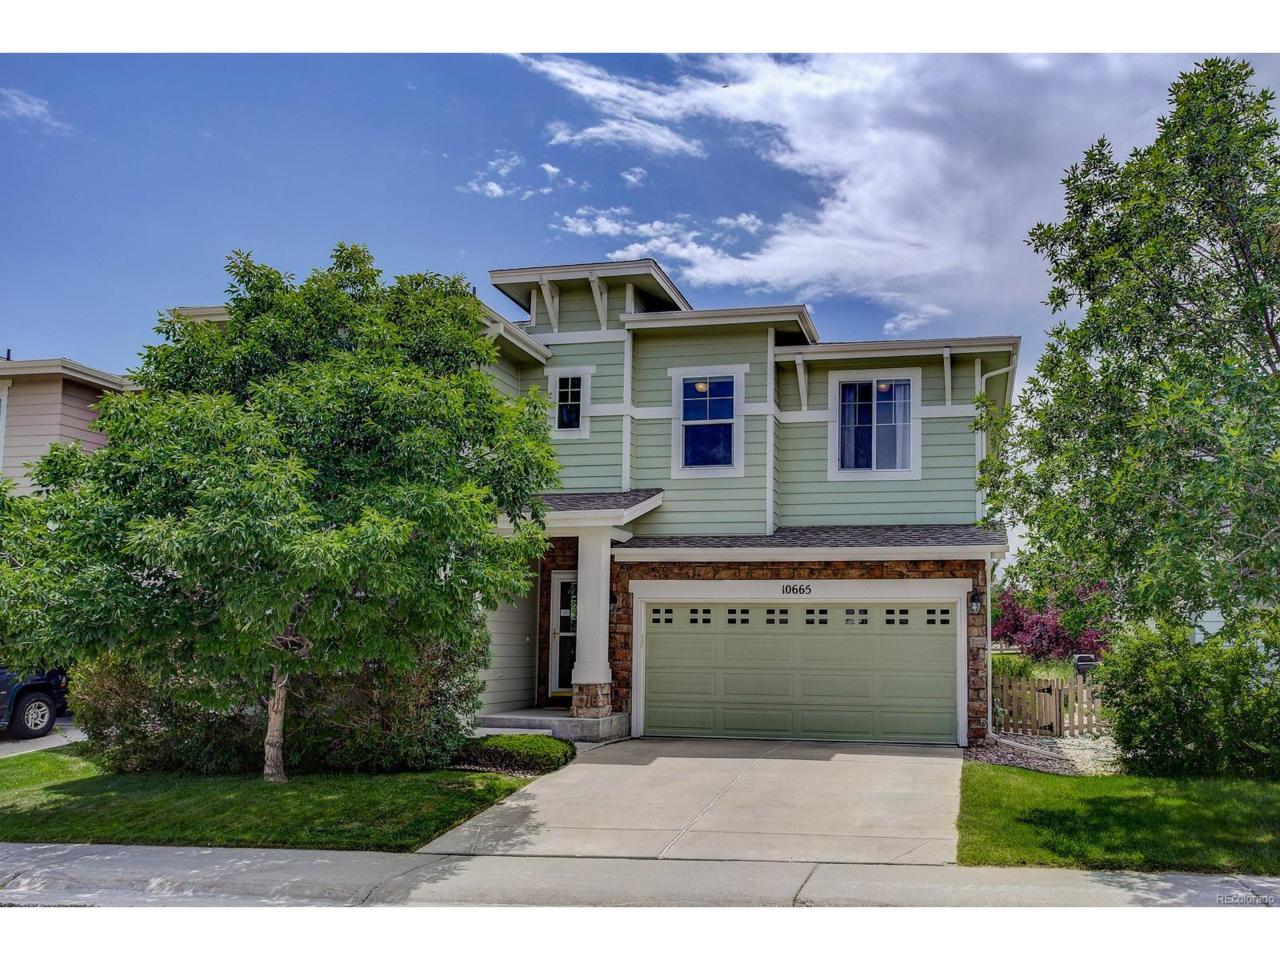 10665 Cherrybrook Circle, Highlands Ranch, CO 80126 (MLS #4344077) :: 8z Real Estate